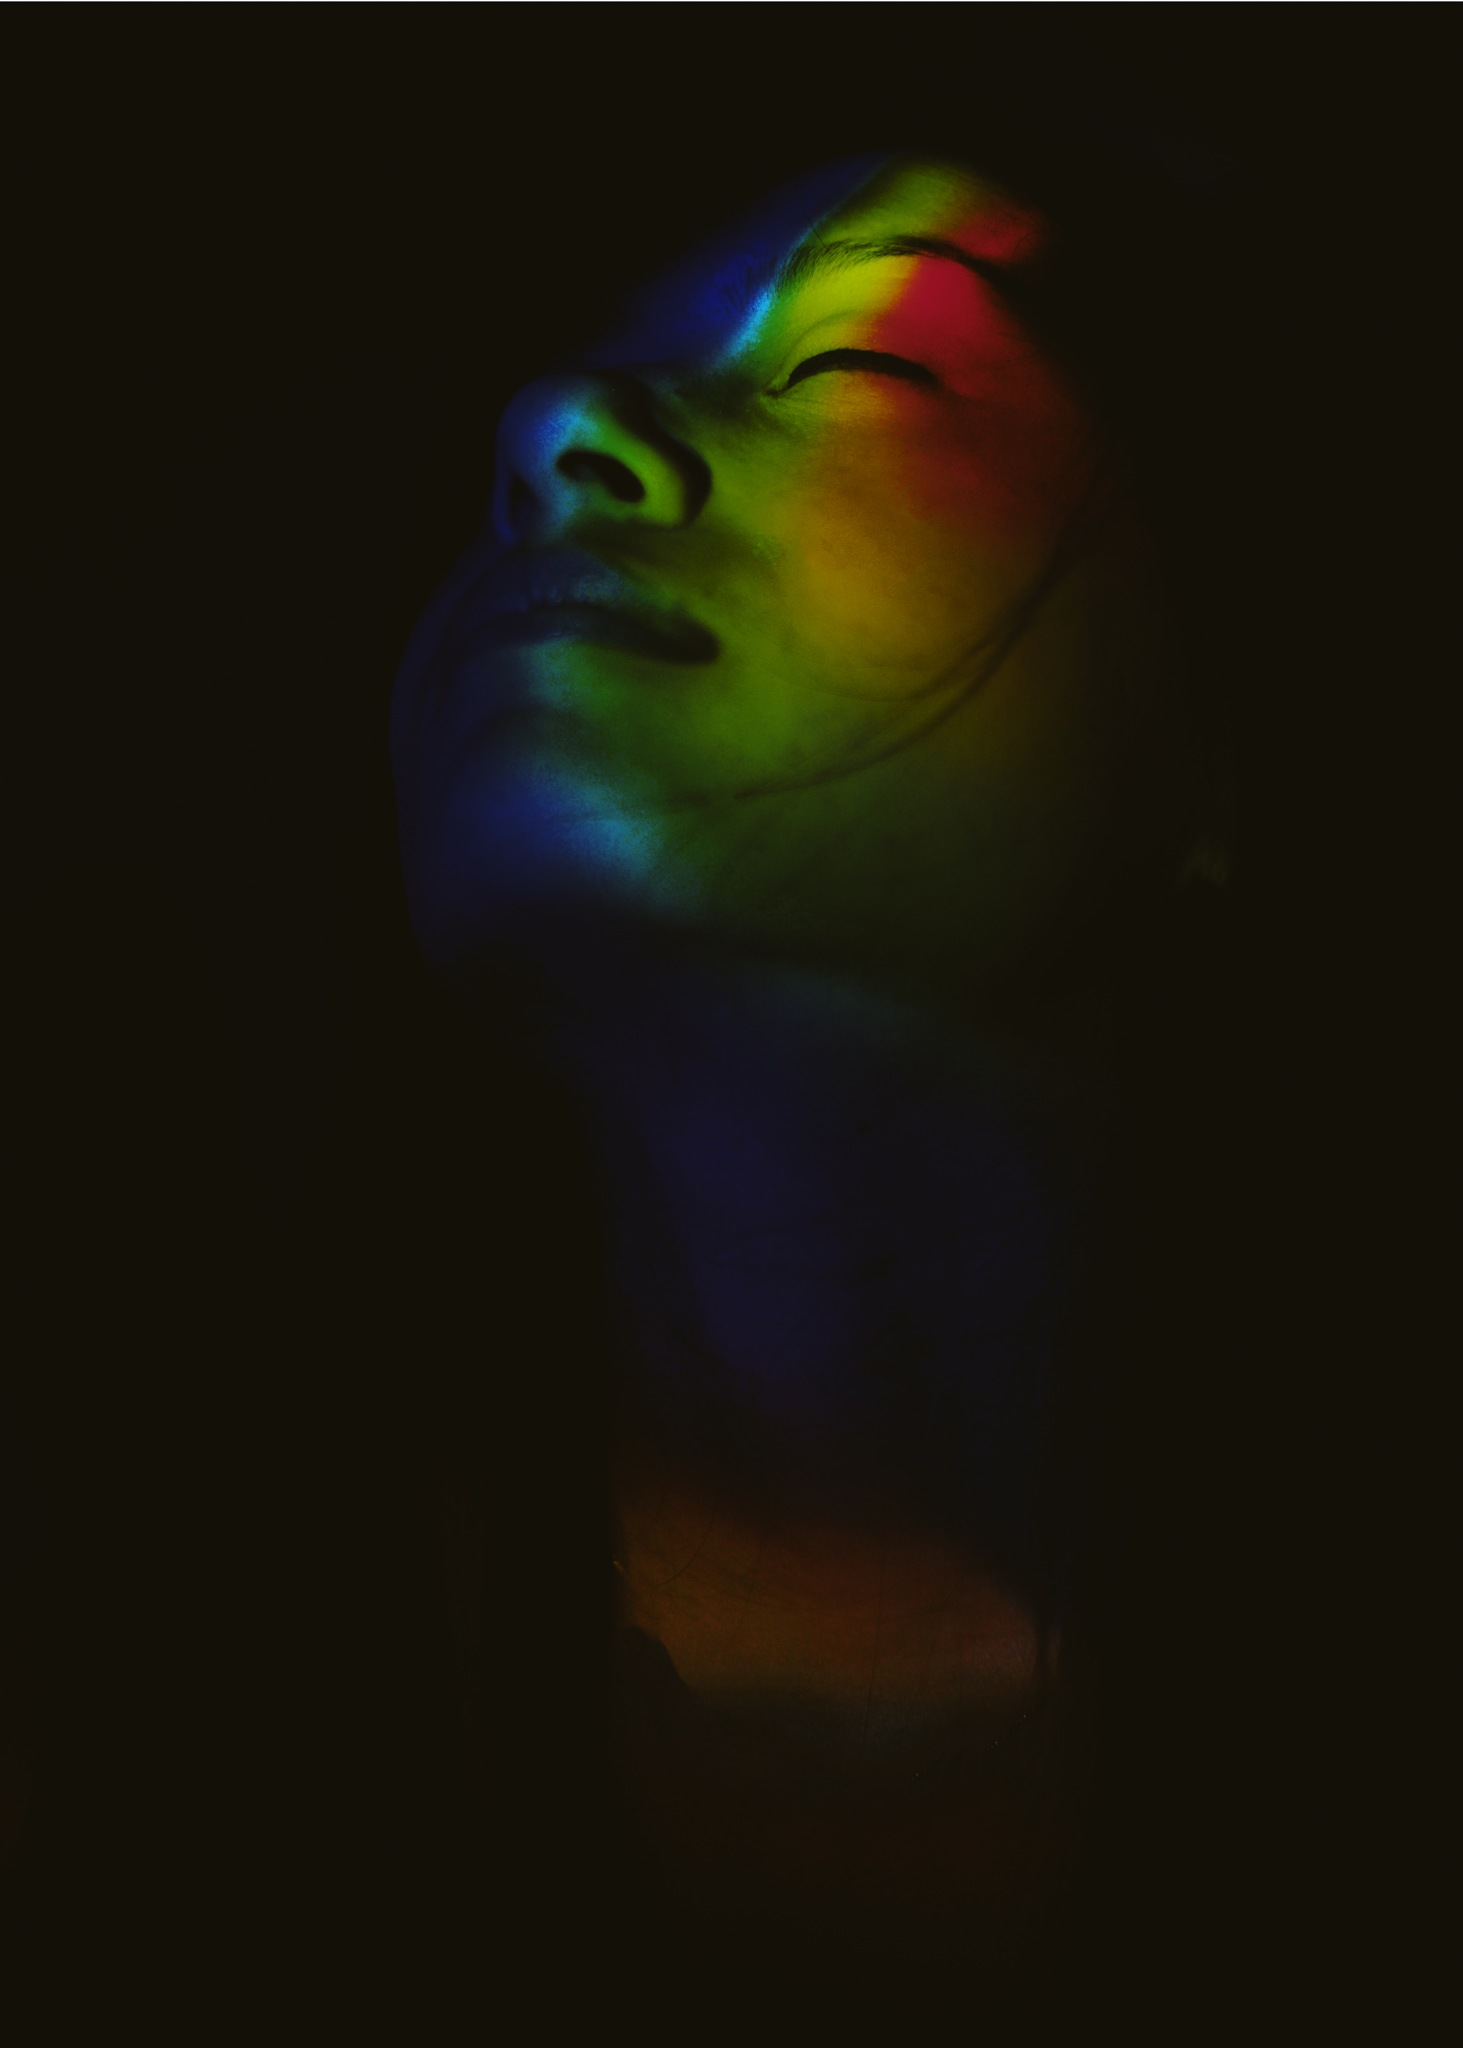 C O L O R E F L E C T I O N by Meghawee Shakya